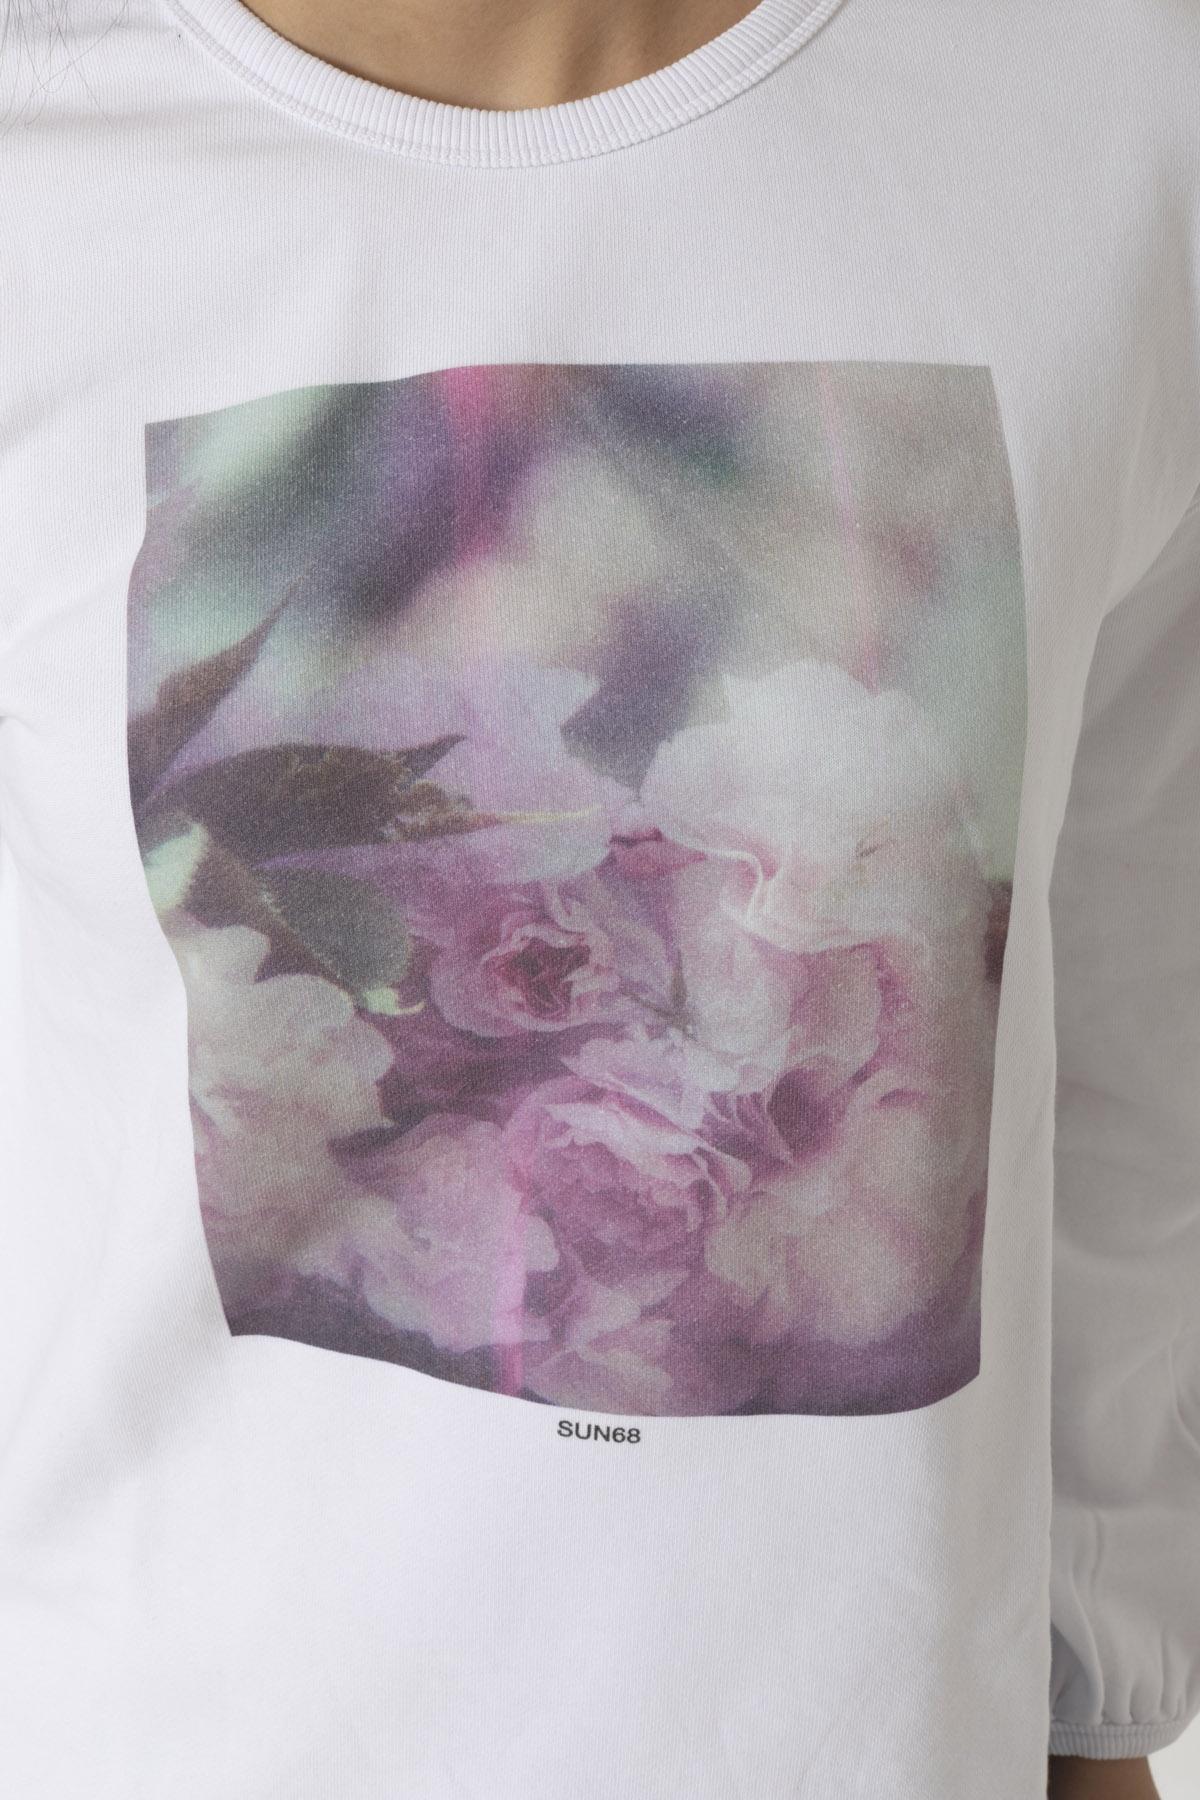 Sweatshirt for woman SUN68 S/S 21